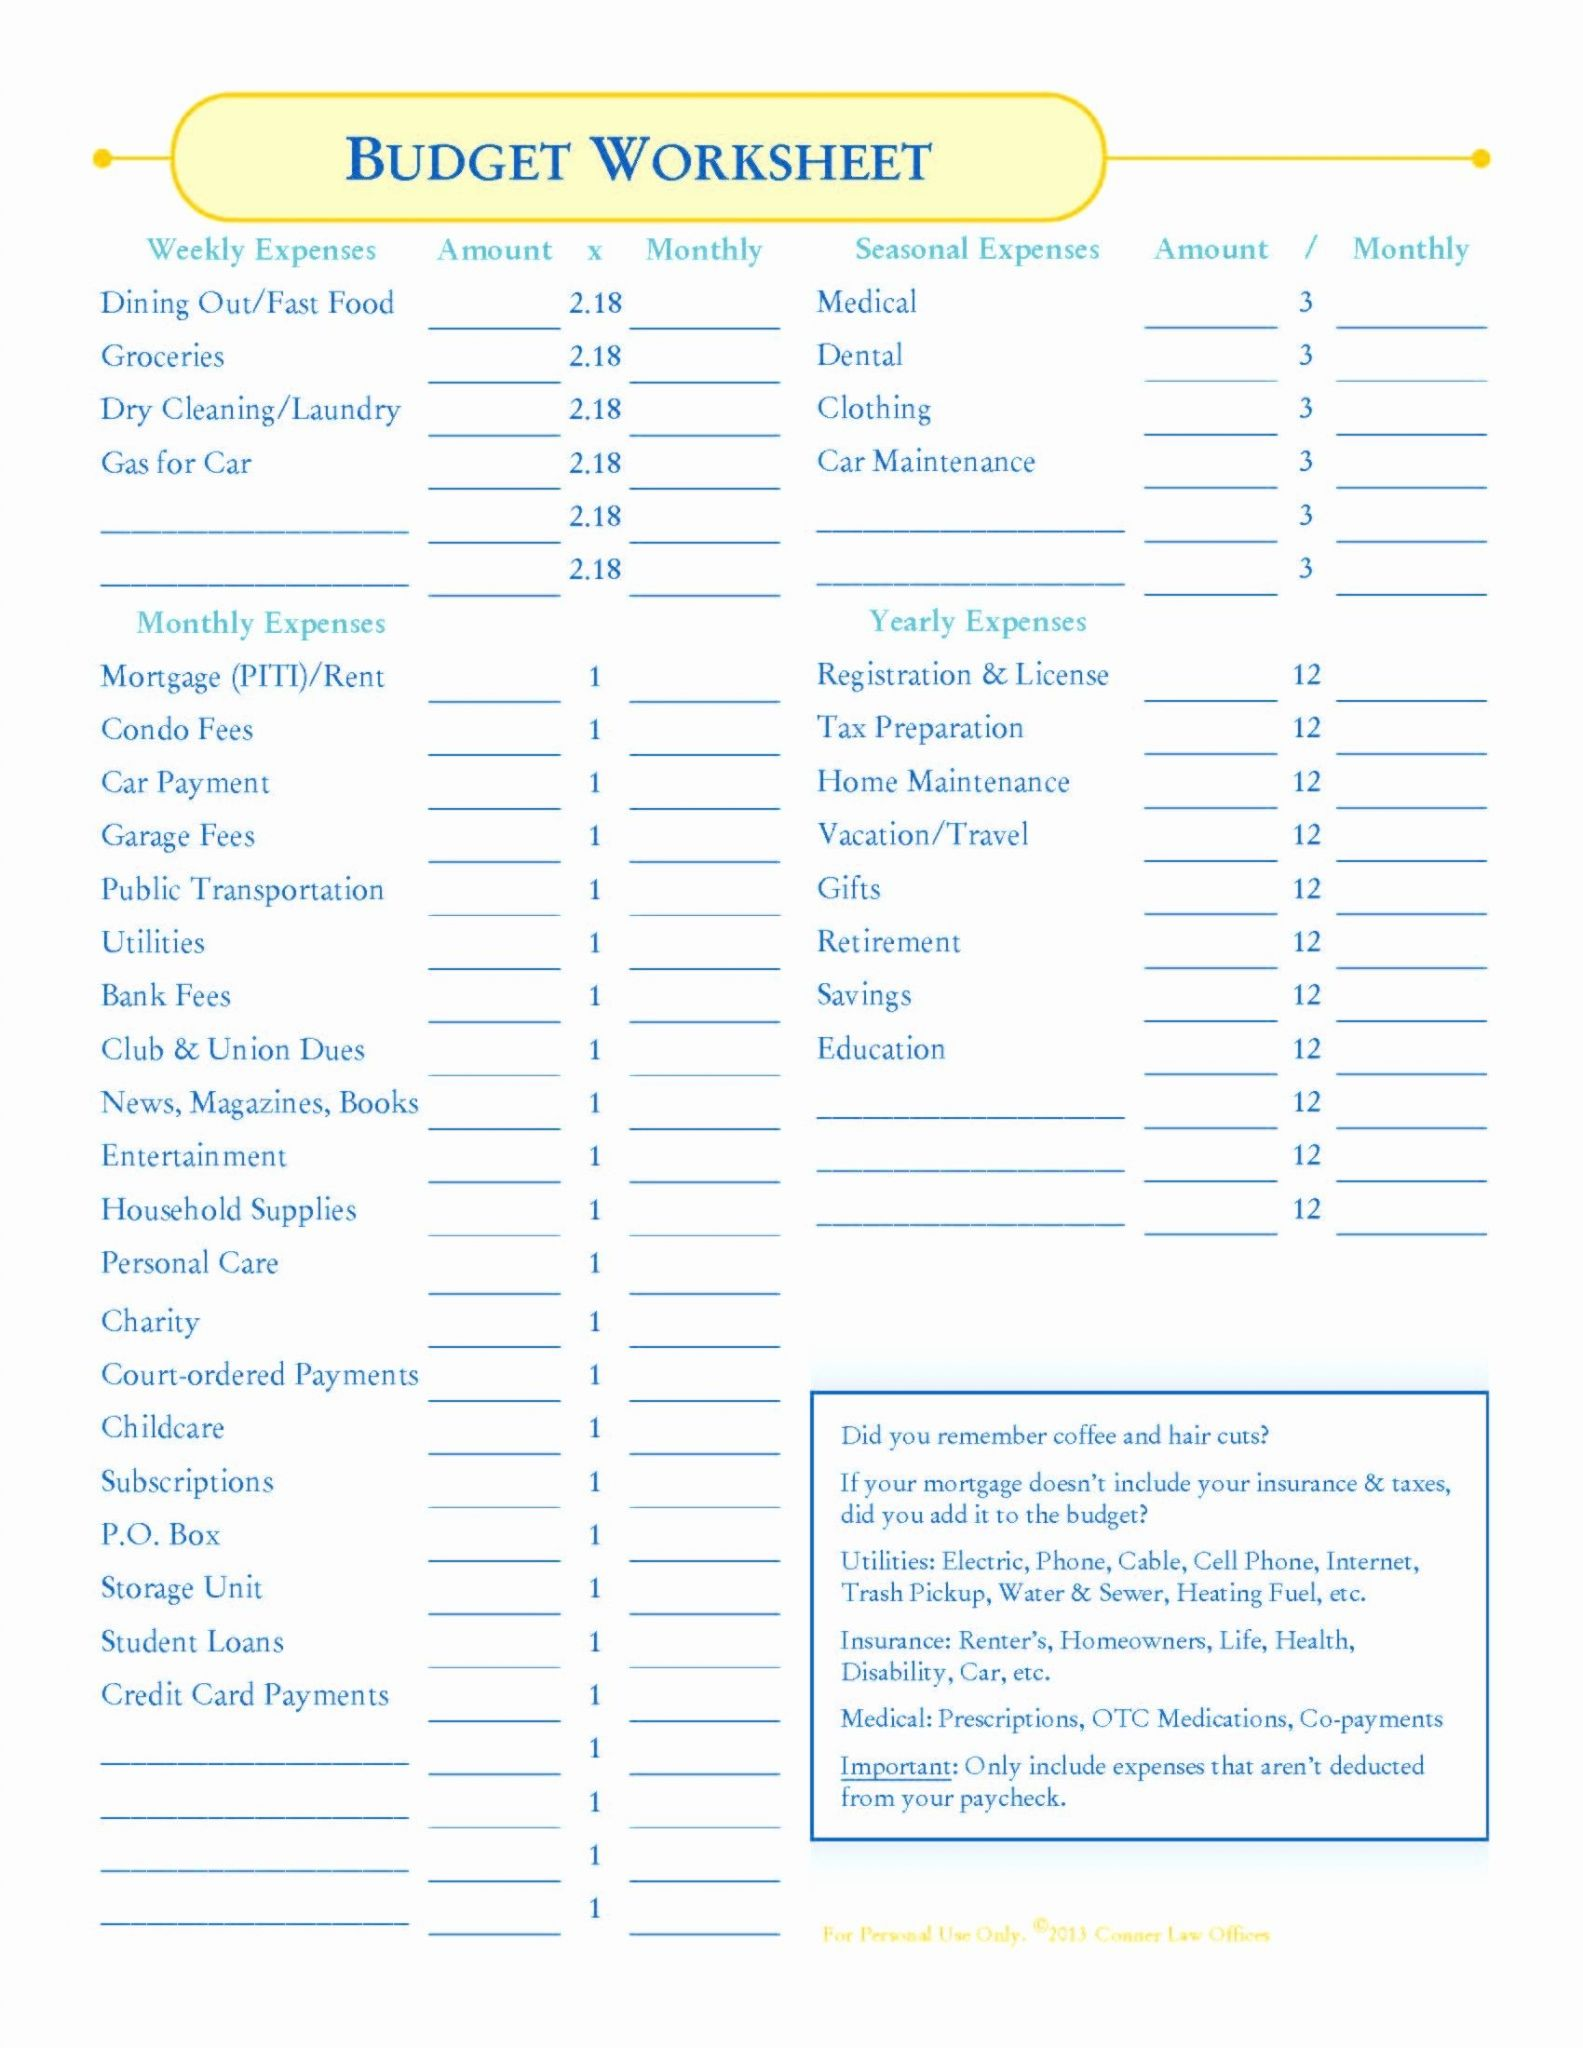 Closing Cost Worksheet